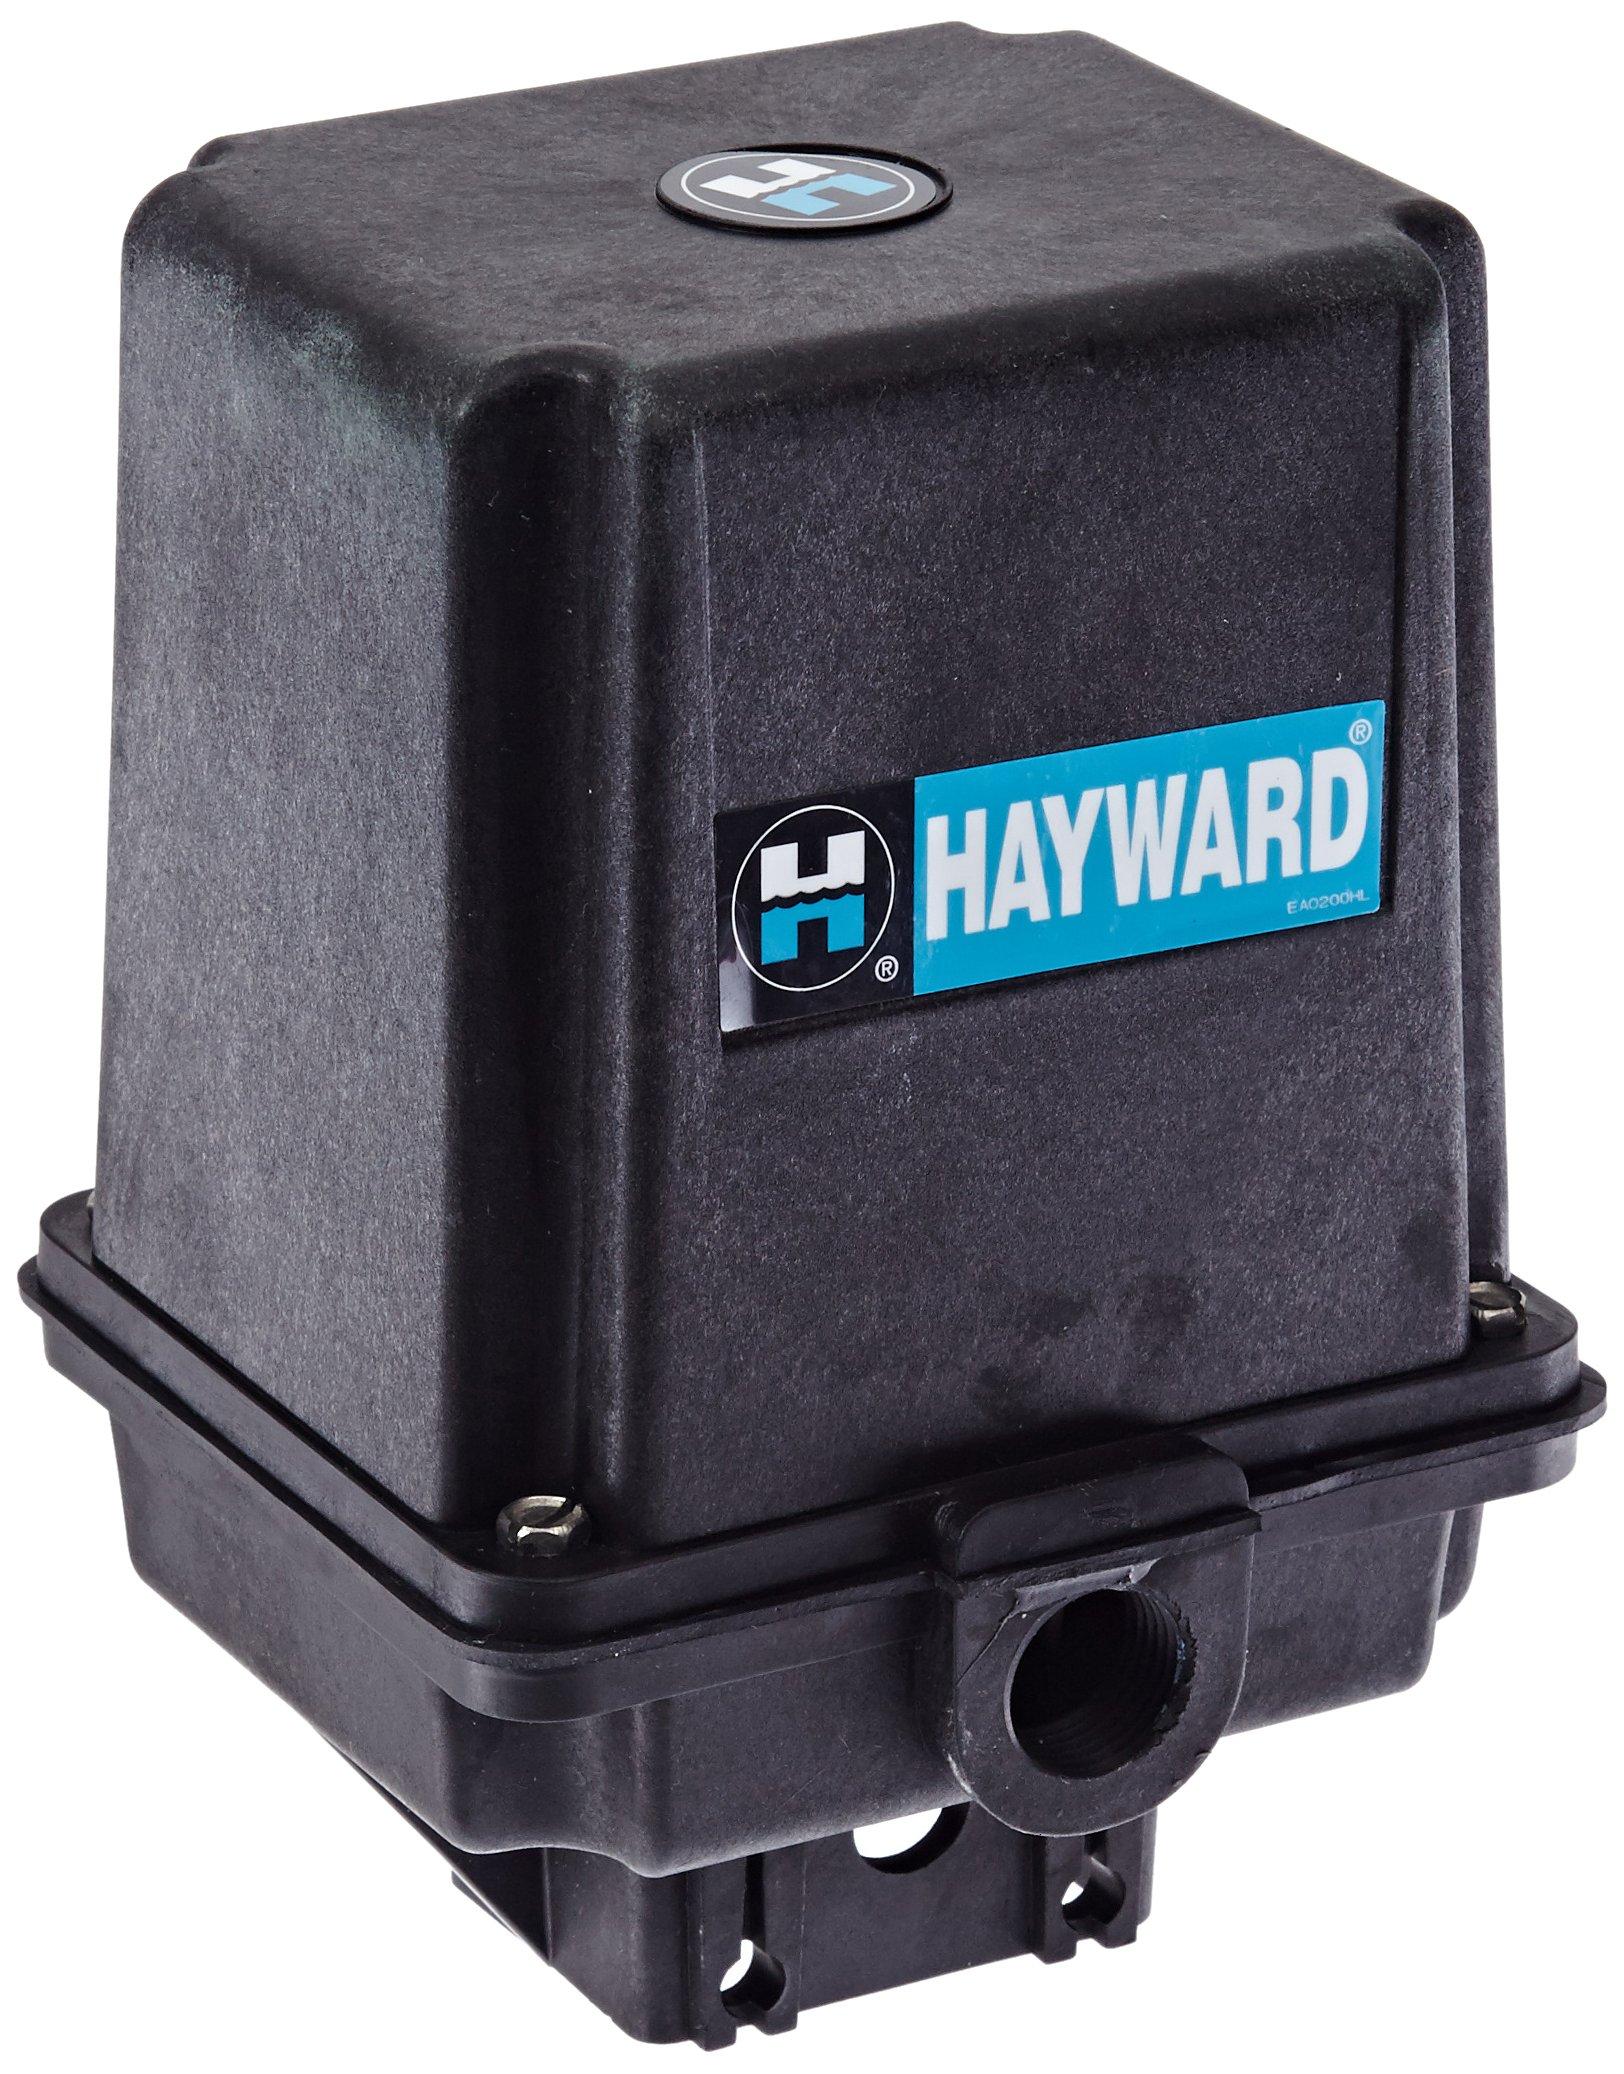 Hayward EAU29 Electric Actuator, 90 Degree Rotation,110V, Fits 1/2'' - 2'' TU Ball Valves, Light Duty